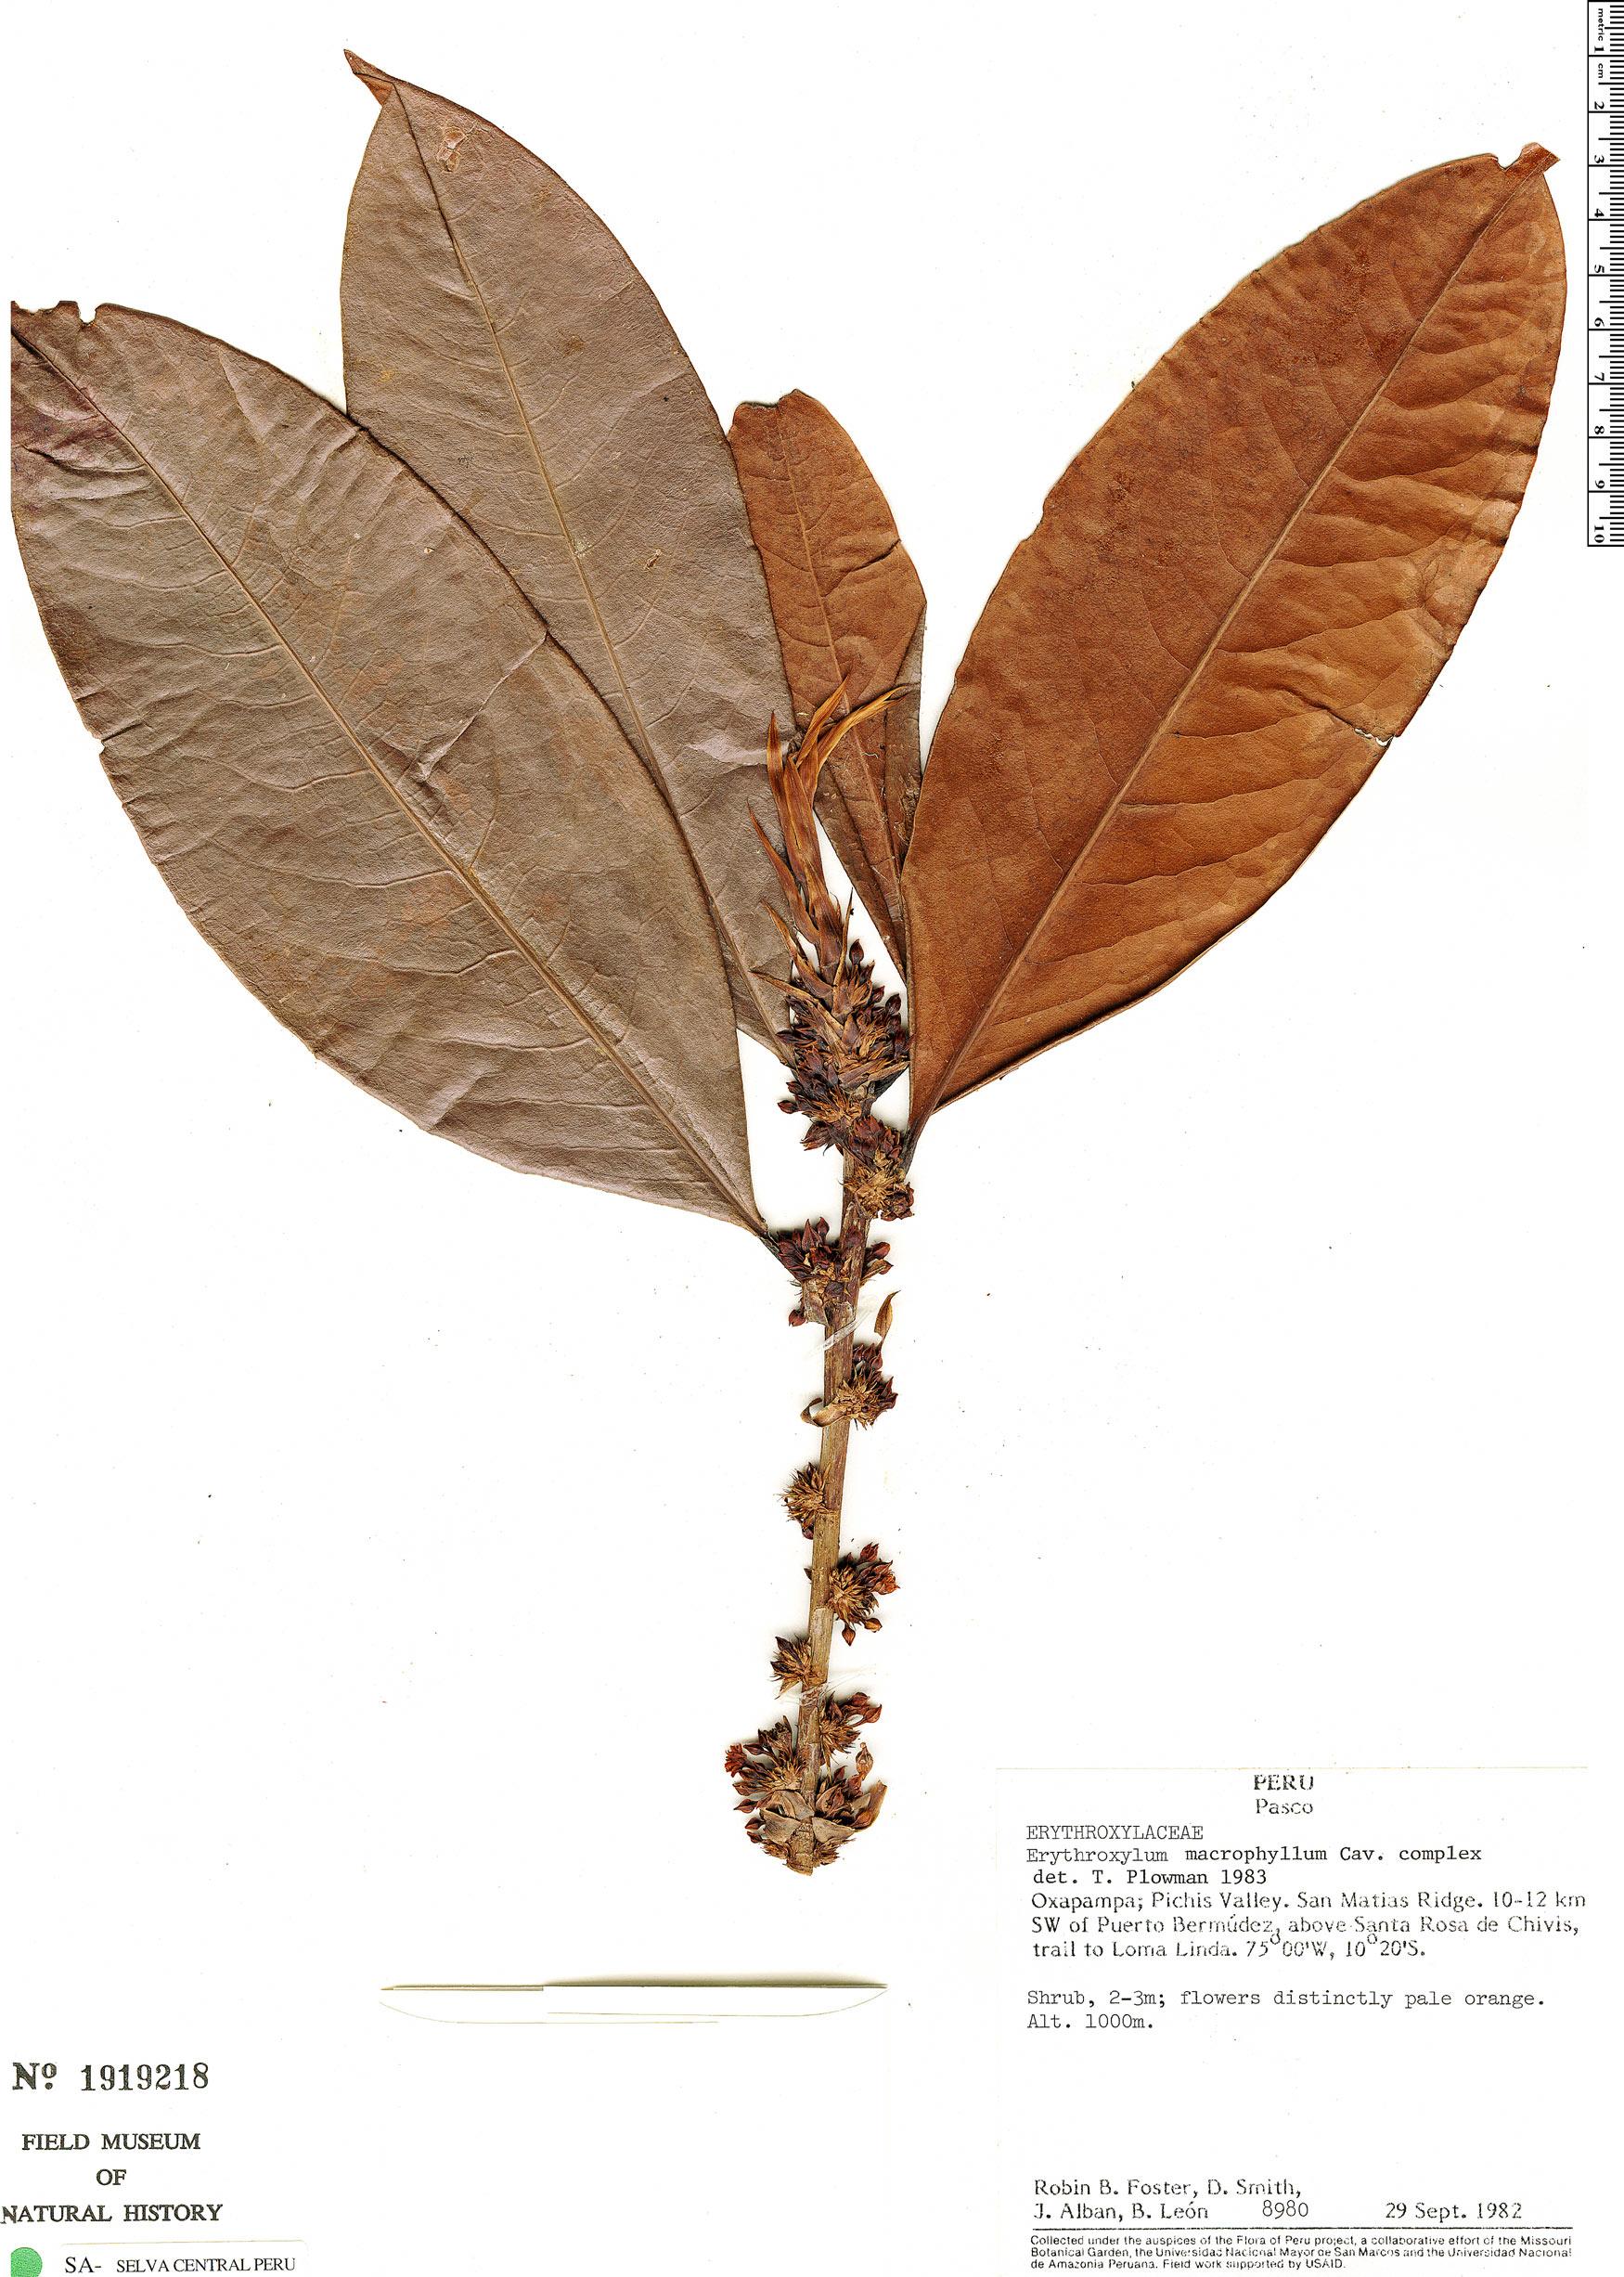 Specimen: Erythroxylum macrophyllum